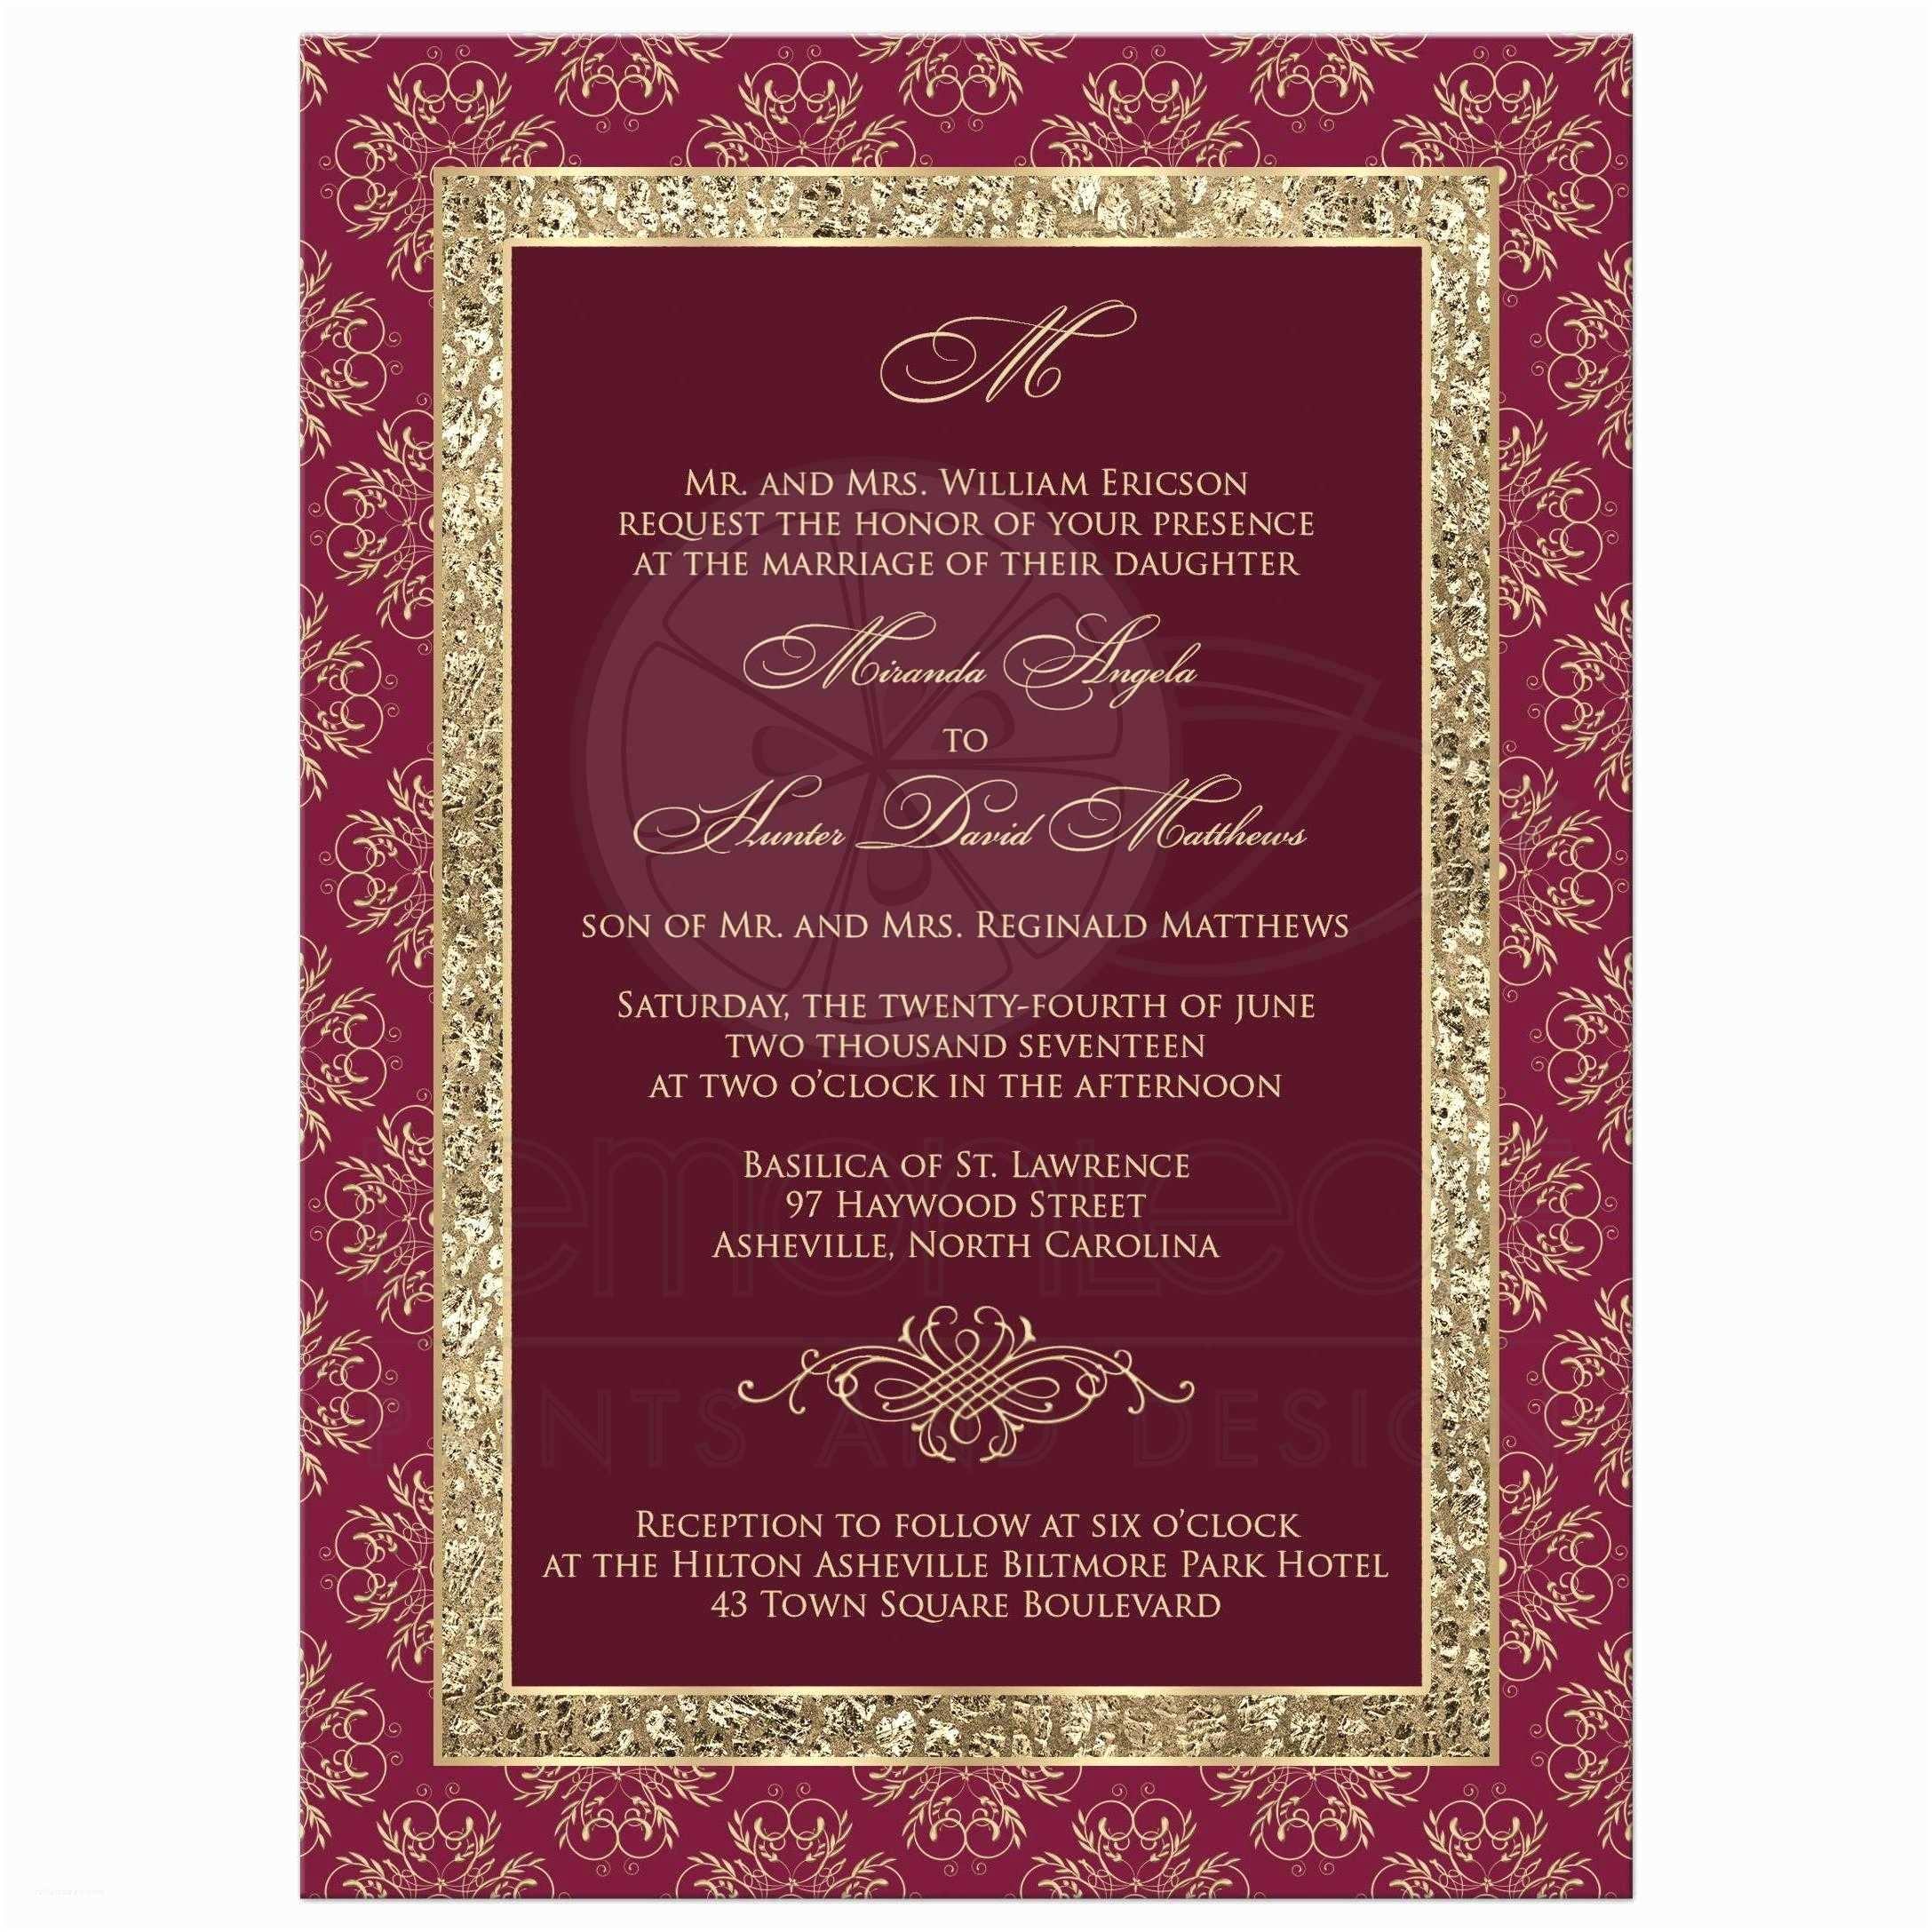 Burgundy themed Wedding Invitations Wedding Invitation Burgundy Gold Elegance